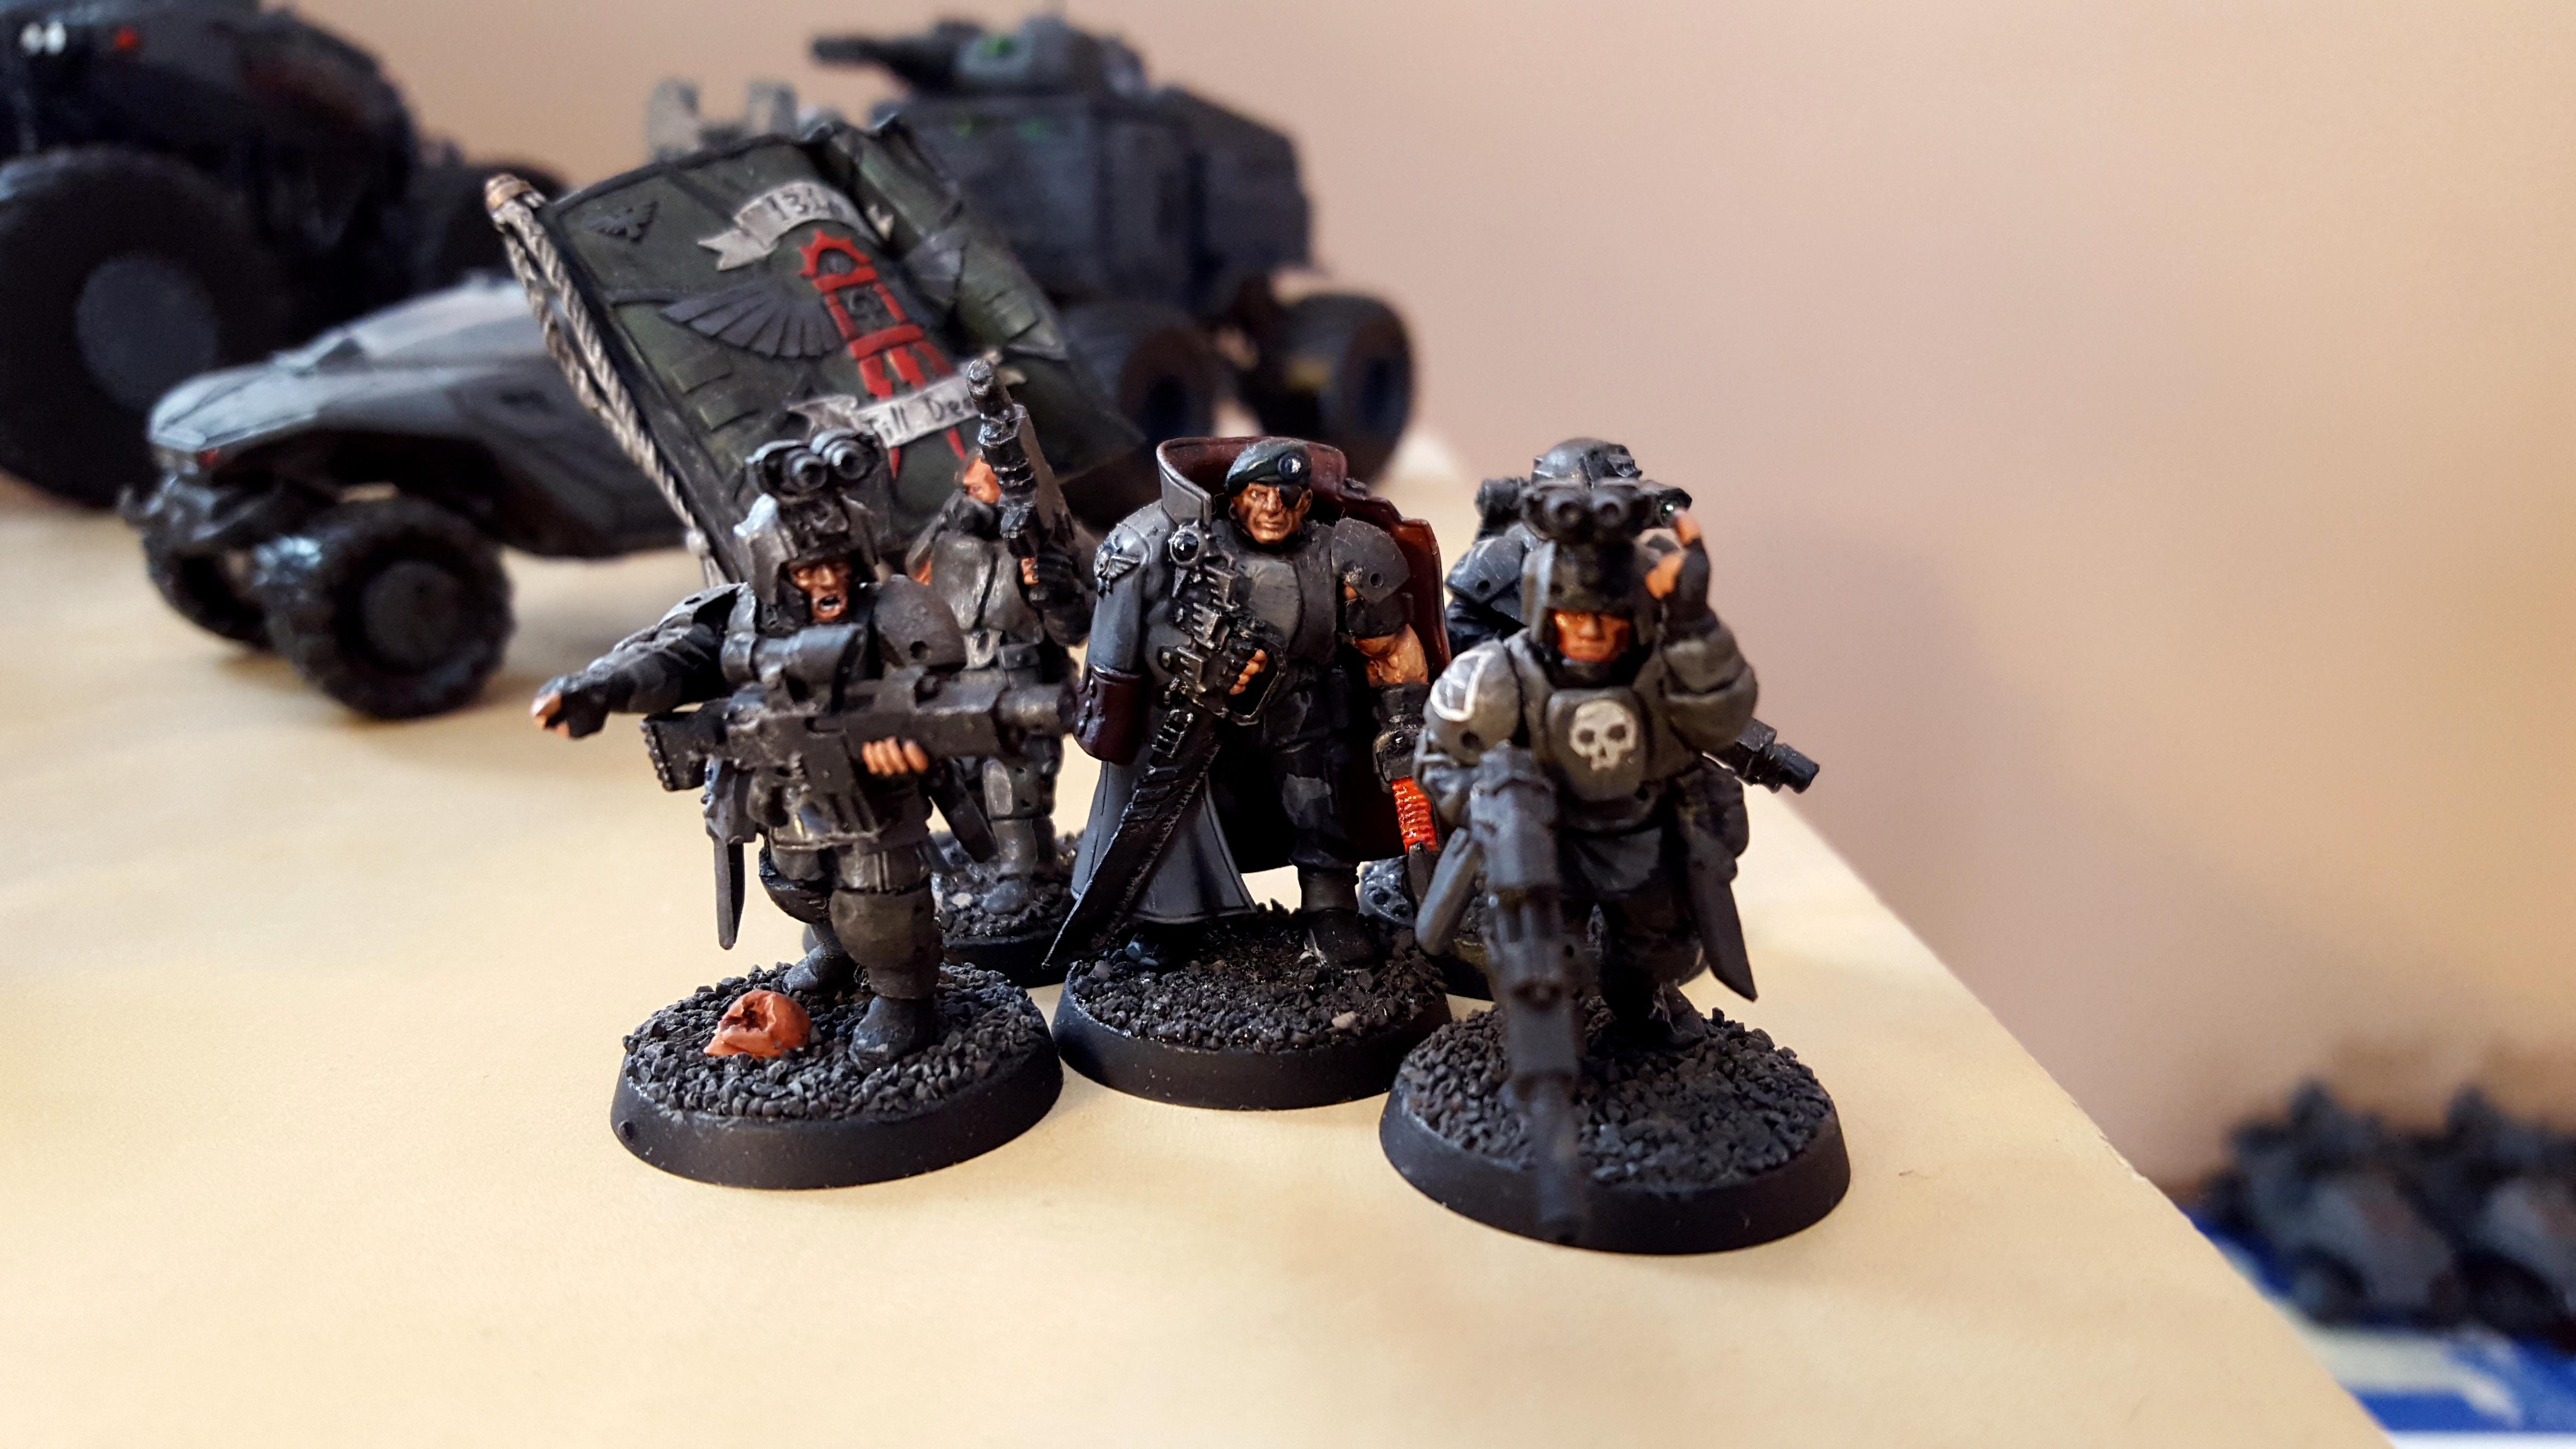 Command, Command Squad, Headquarters, Kasrkin, Militarum Tempestus, Scion, Spec Ops, Special Ops, Standard, Storm Troopers, Stormtrooper